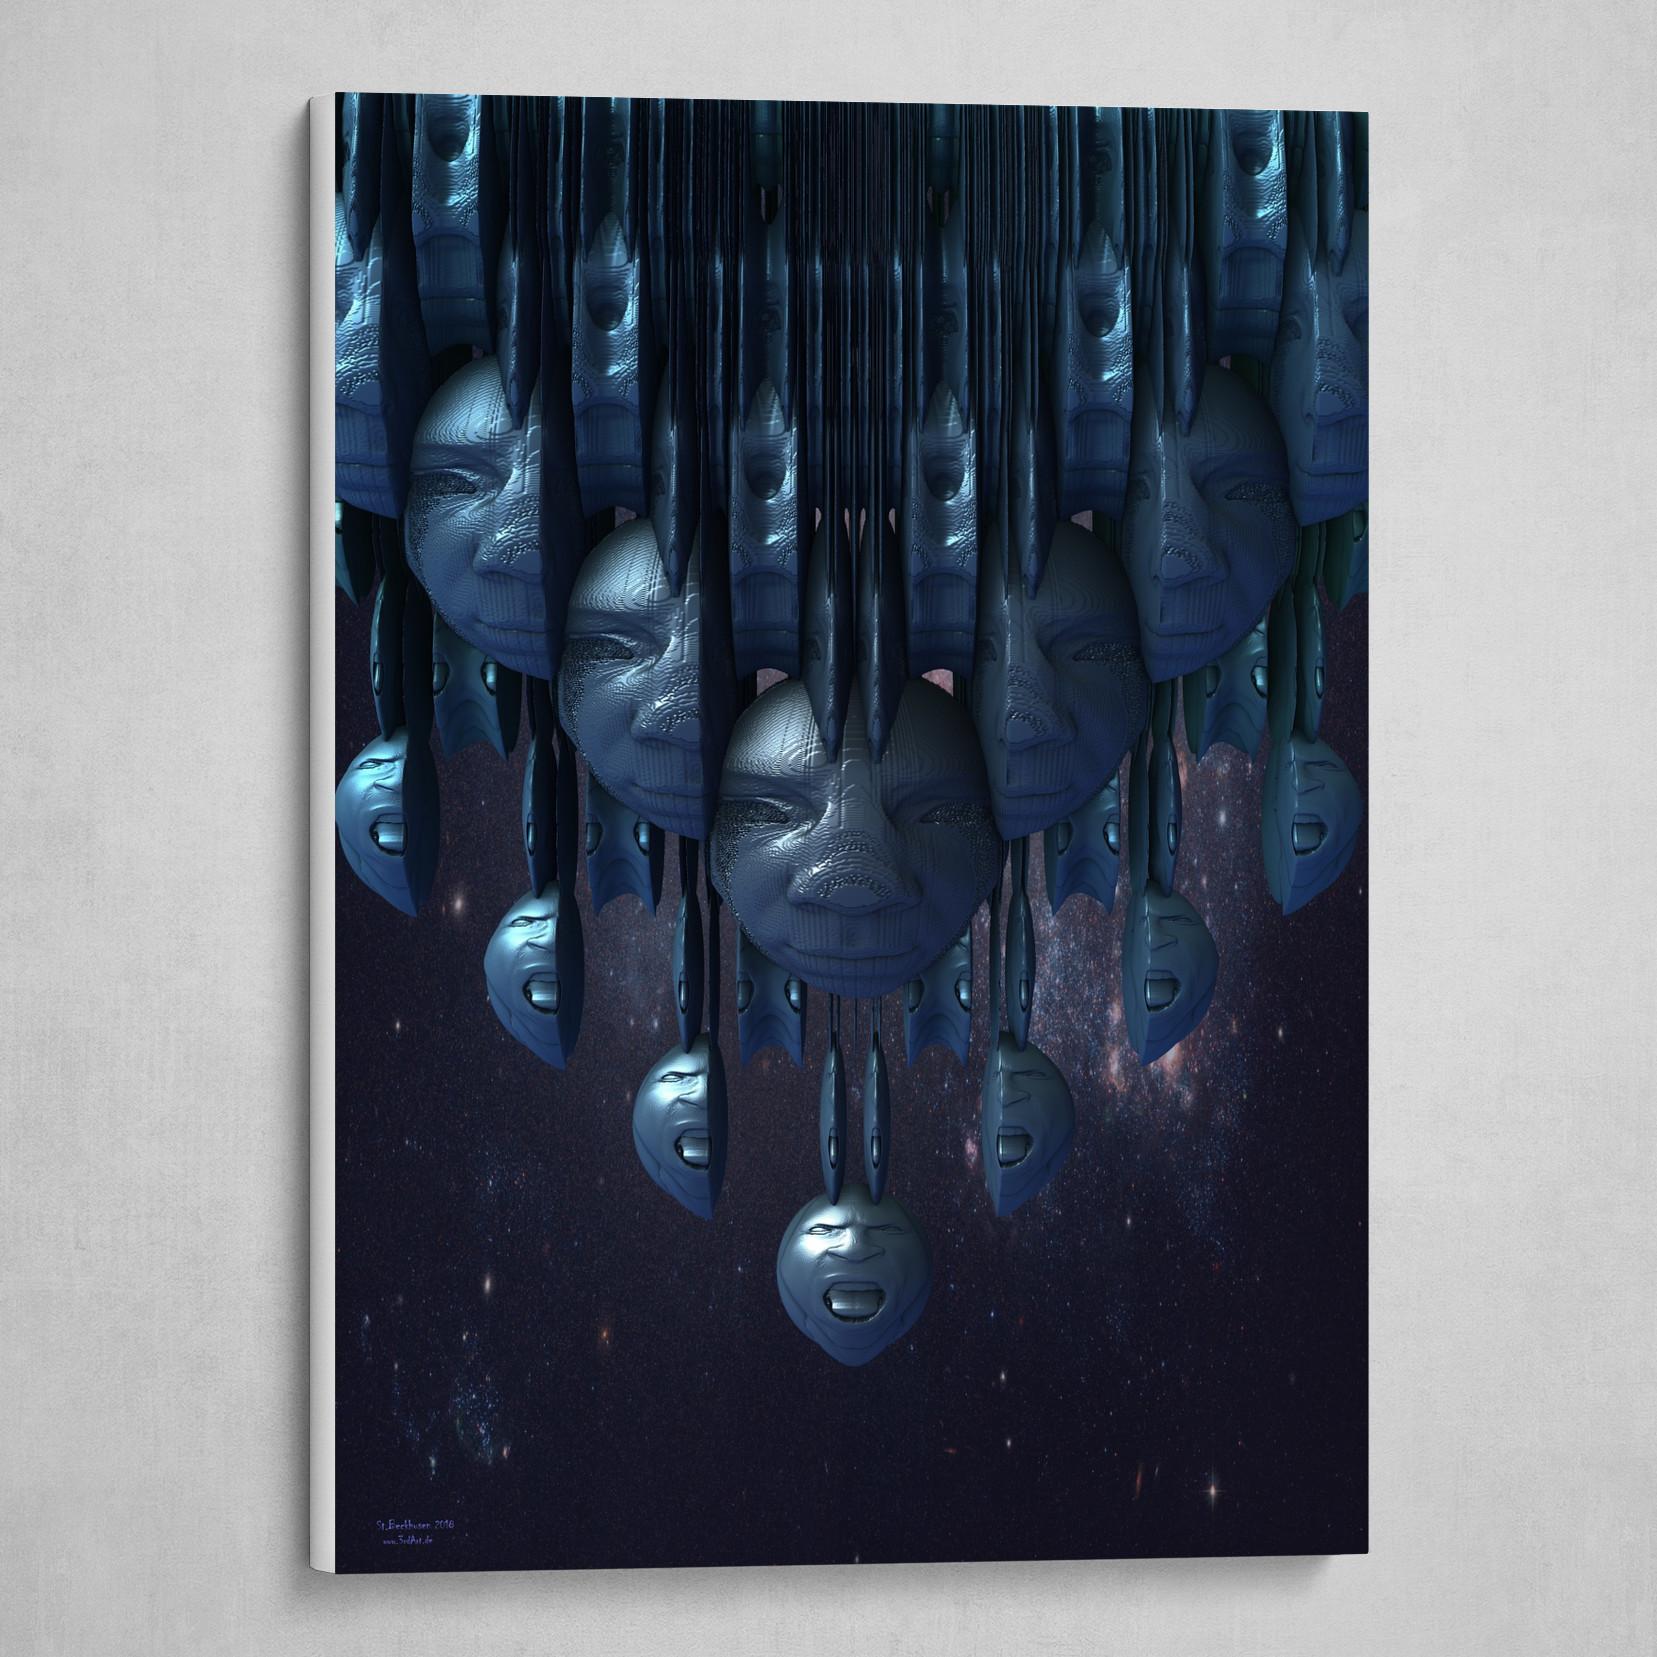 Time Artwork (Blue Edition)